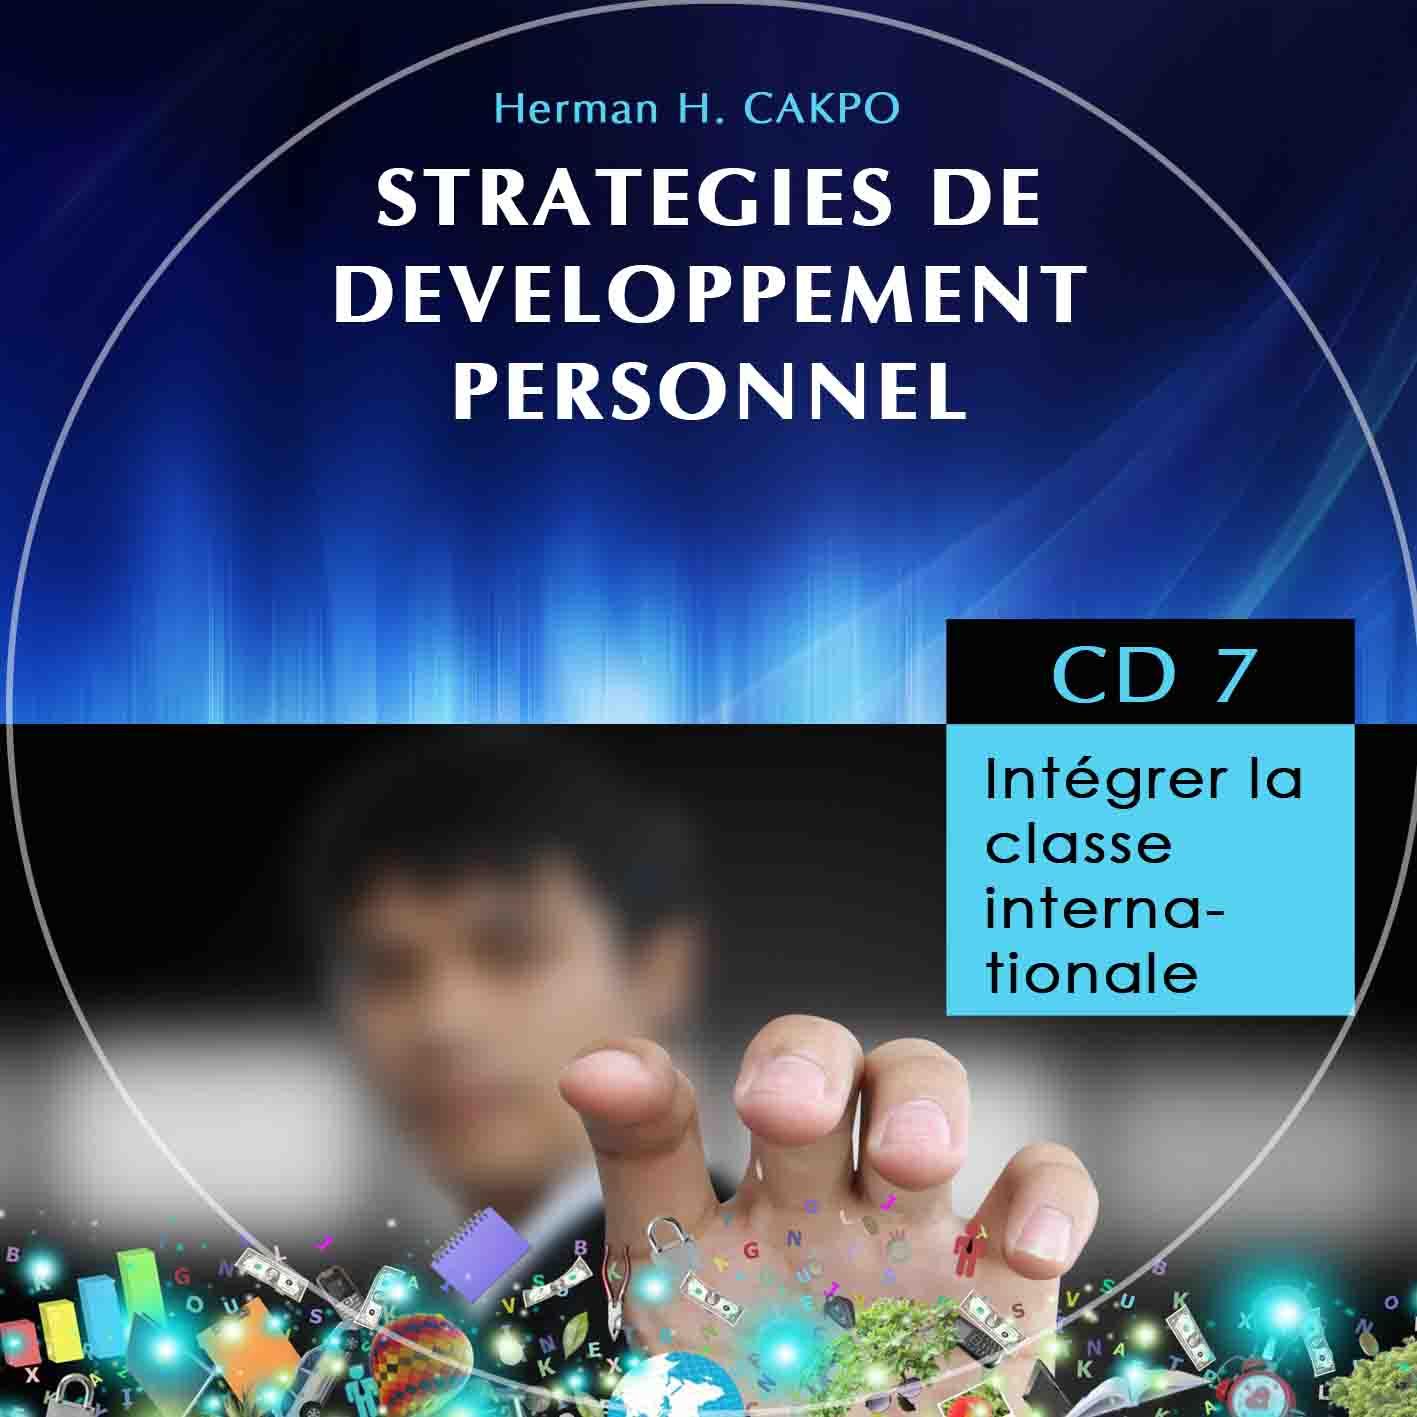 CD- 7